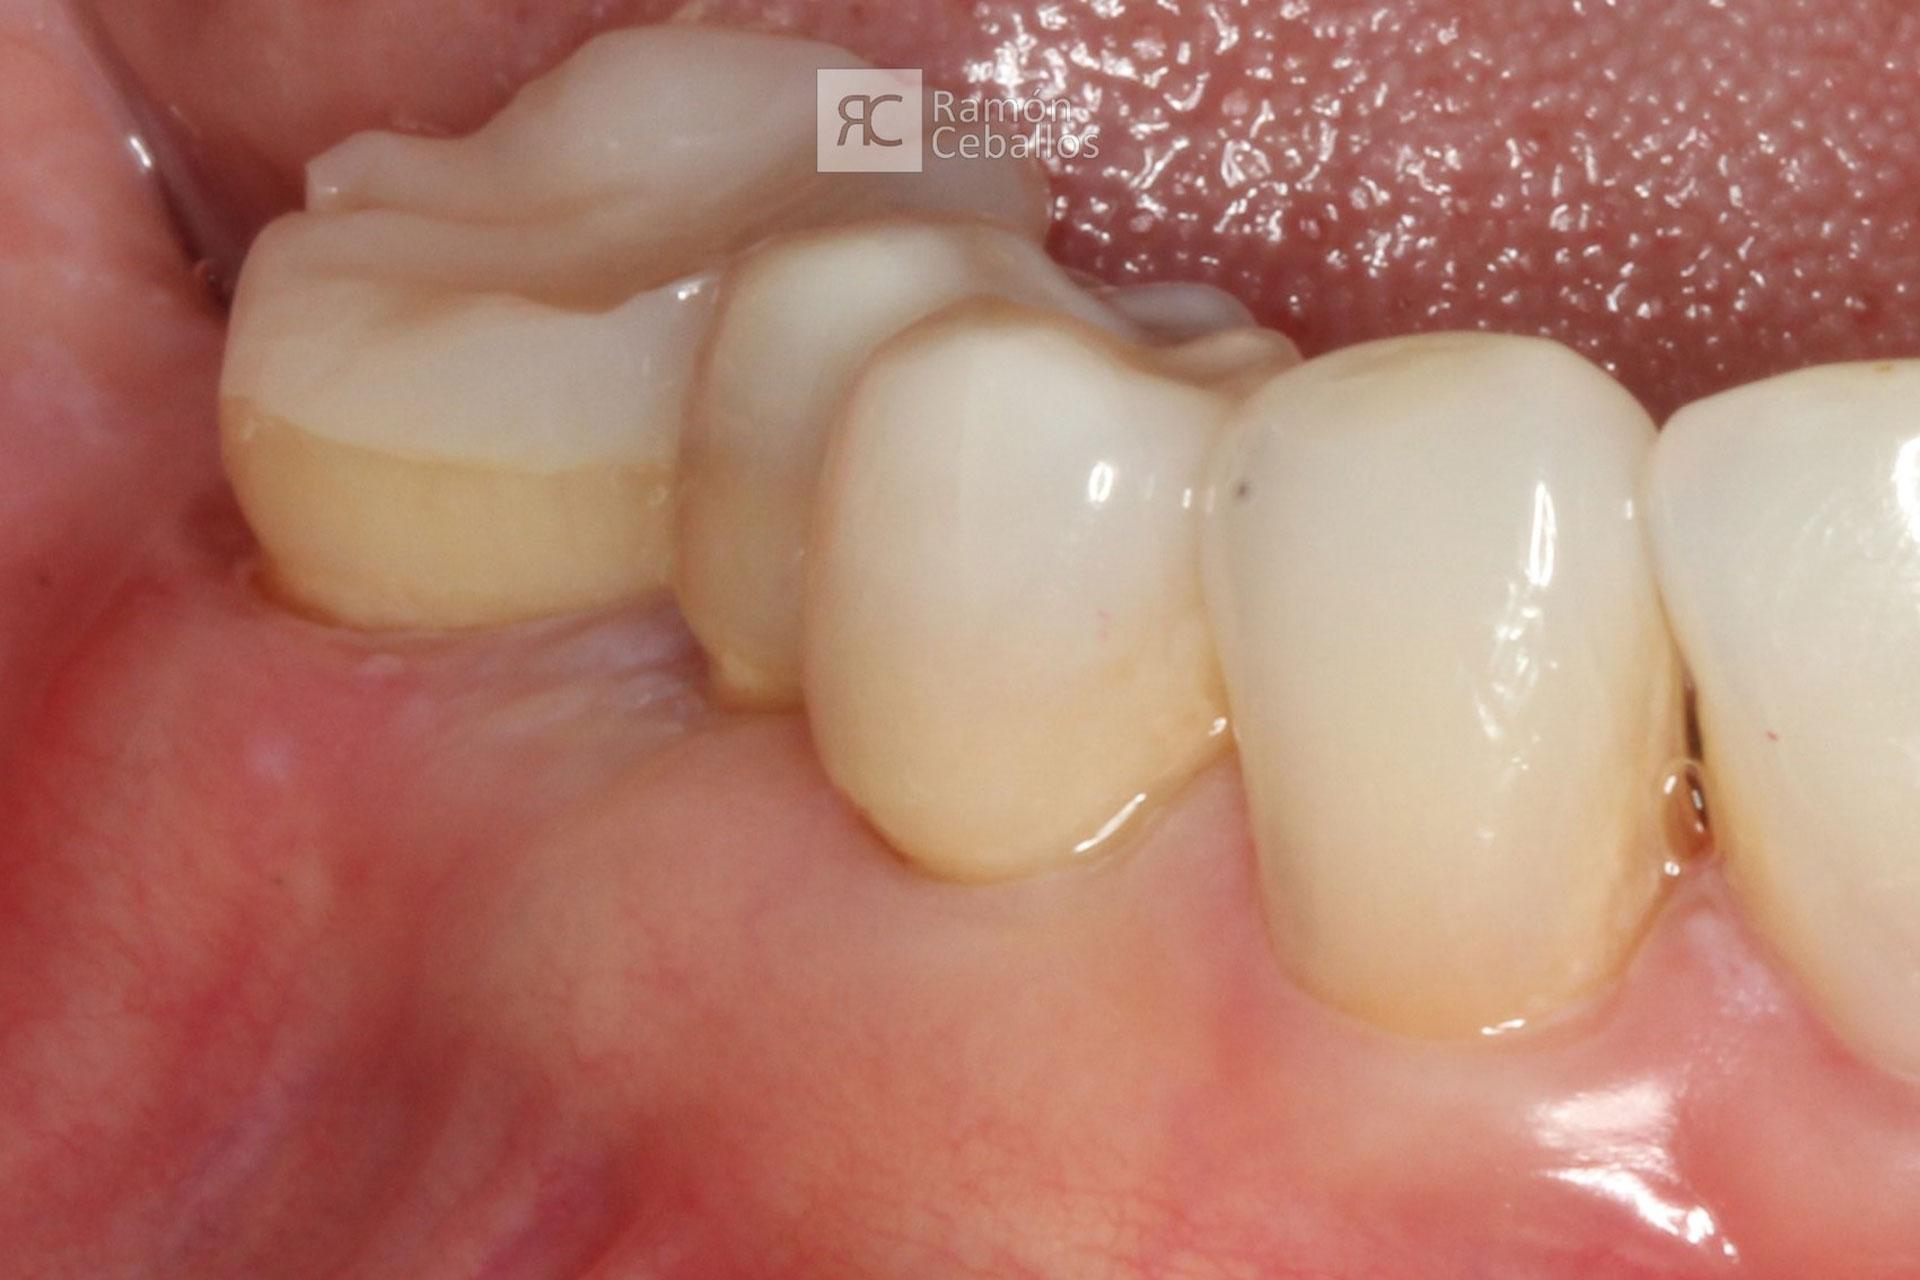 RamonCeballos-covertura-radicular-cervicales-b